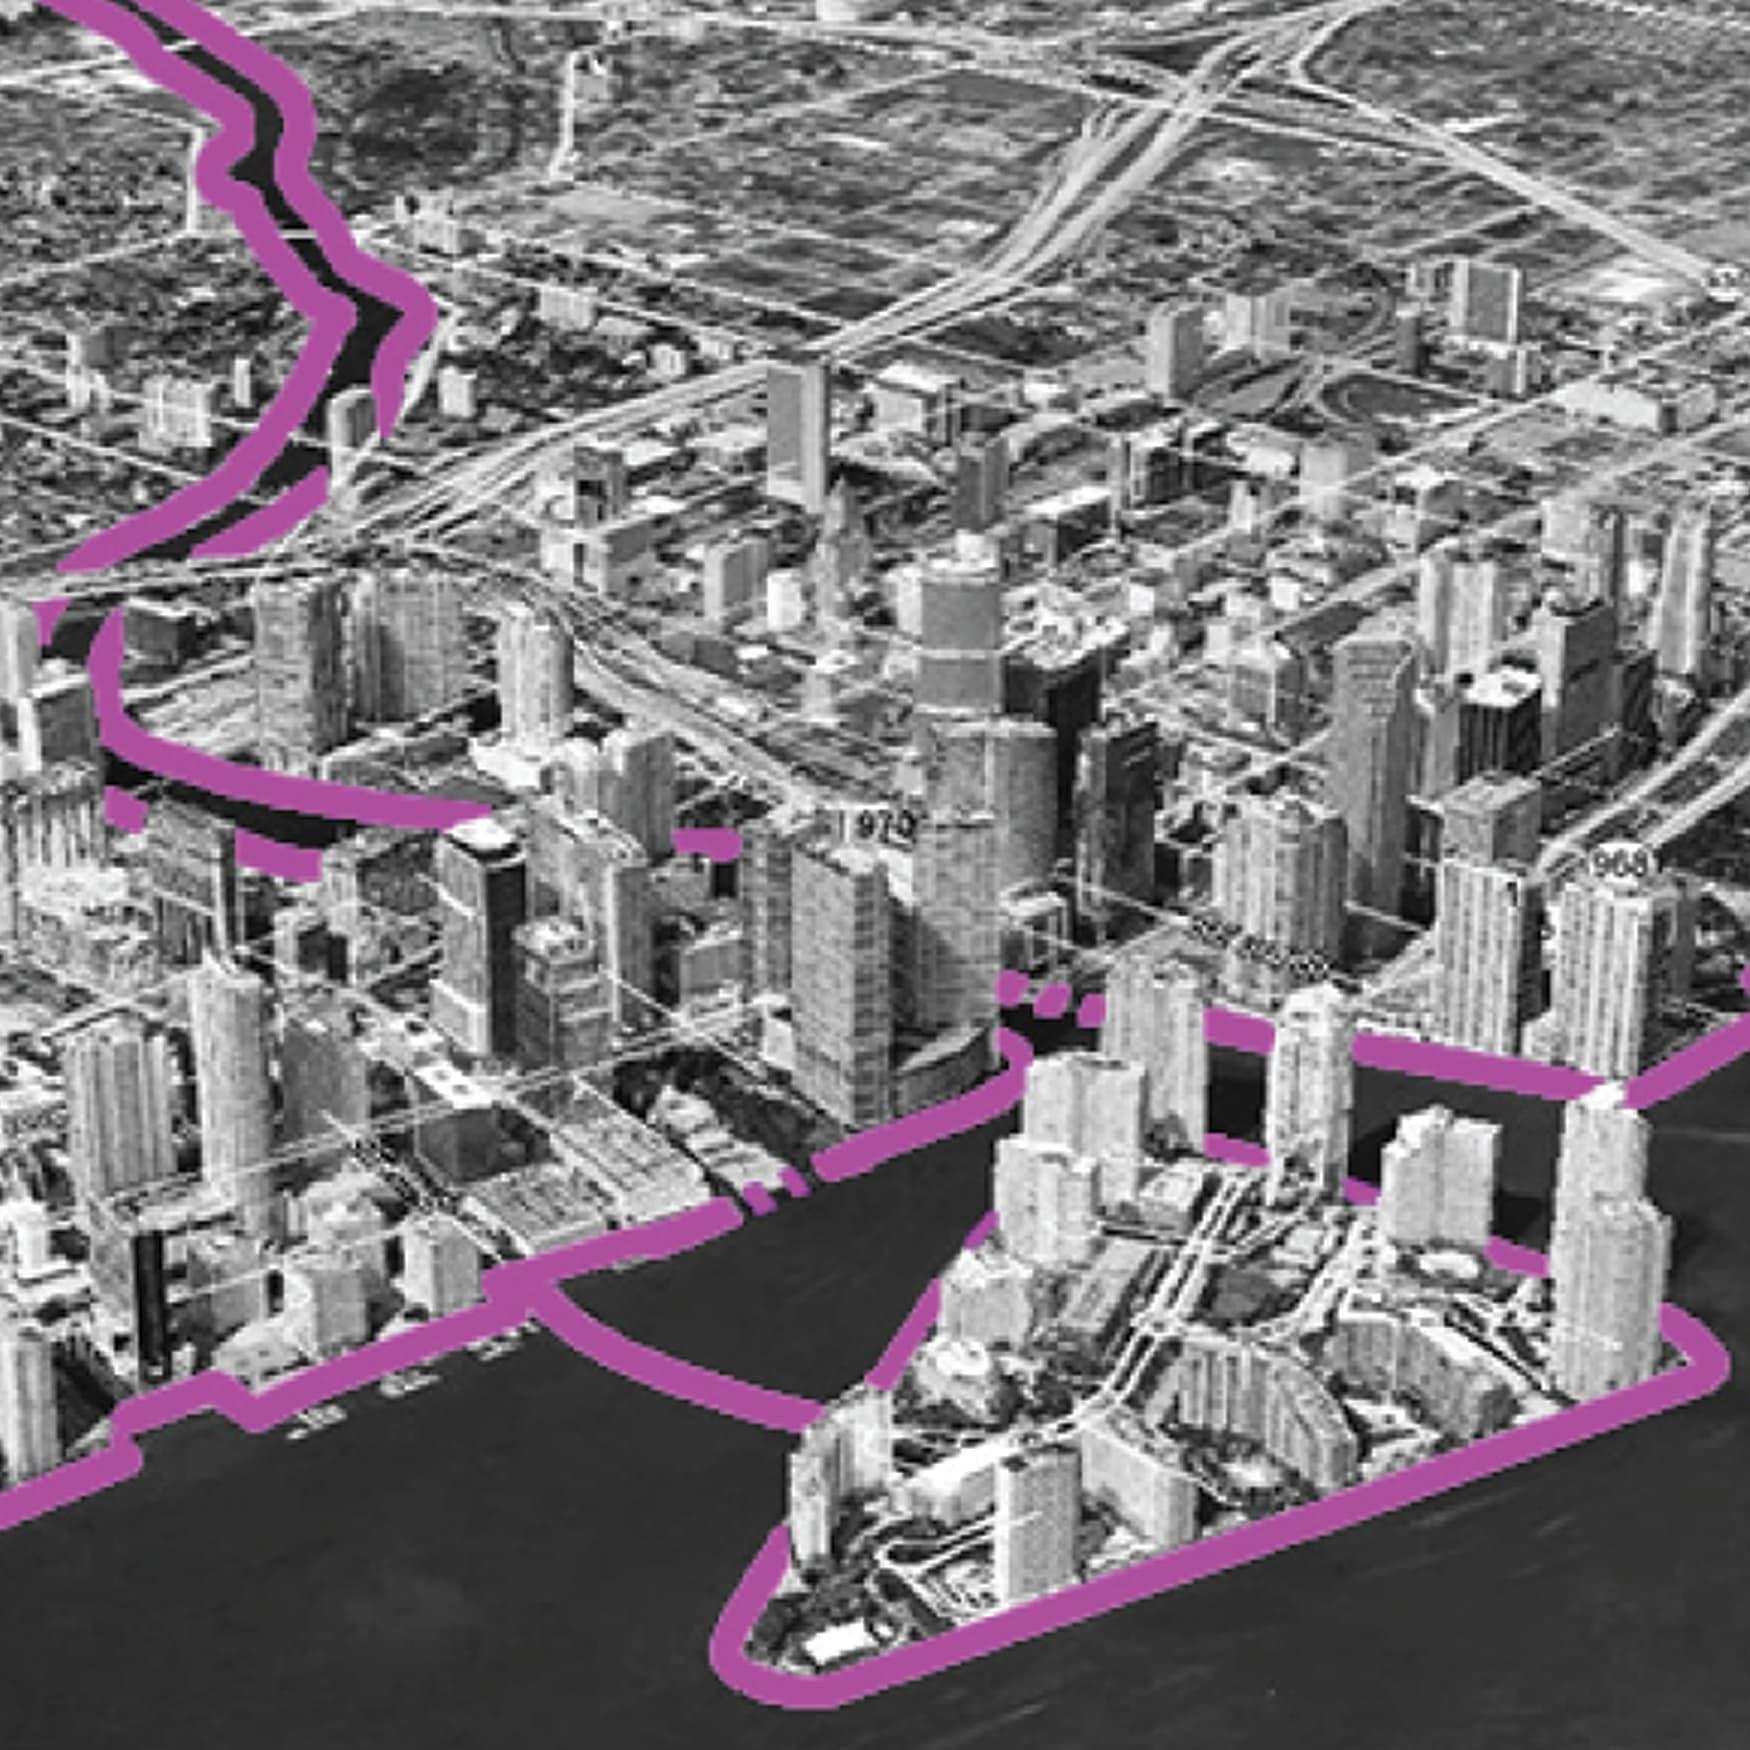 Miami Baywalk Waterfront Design Aerial Map